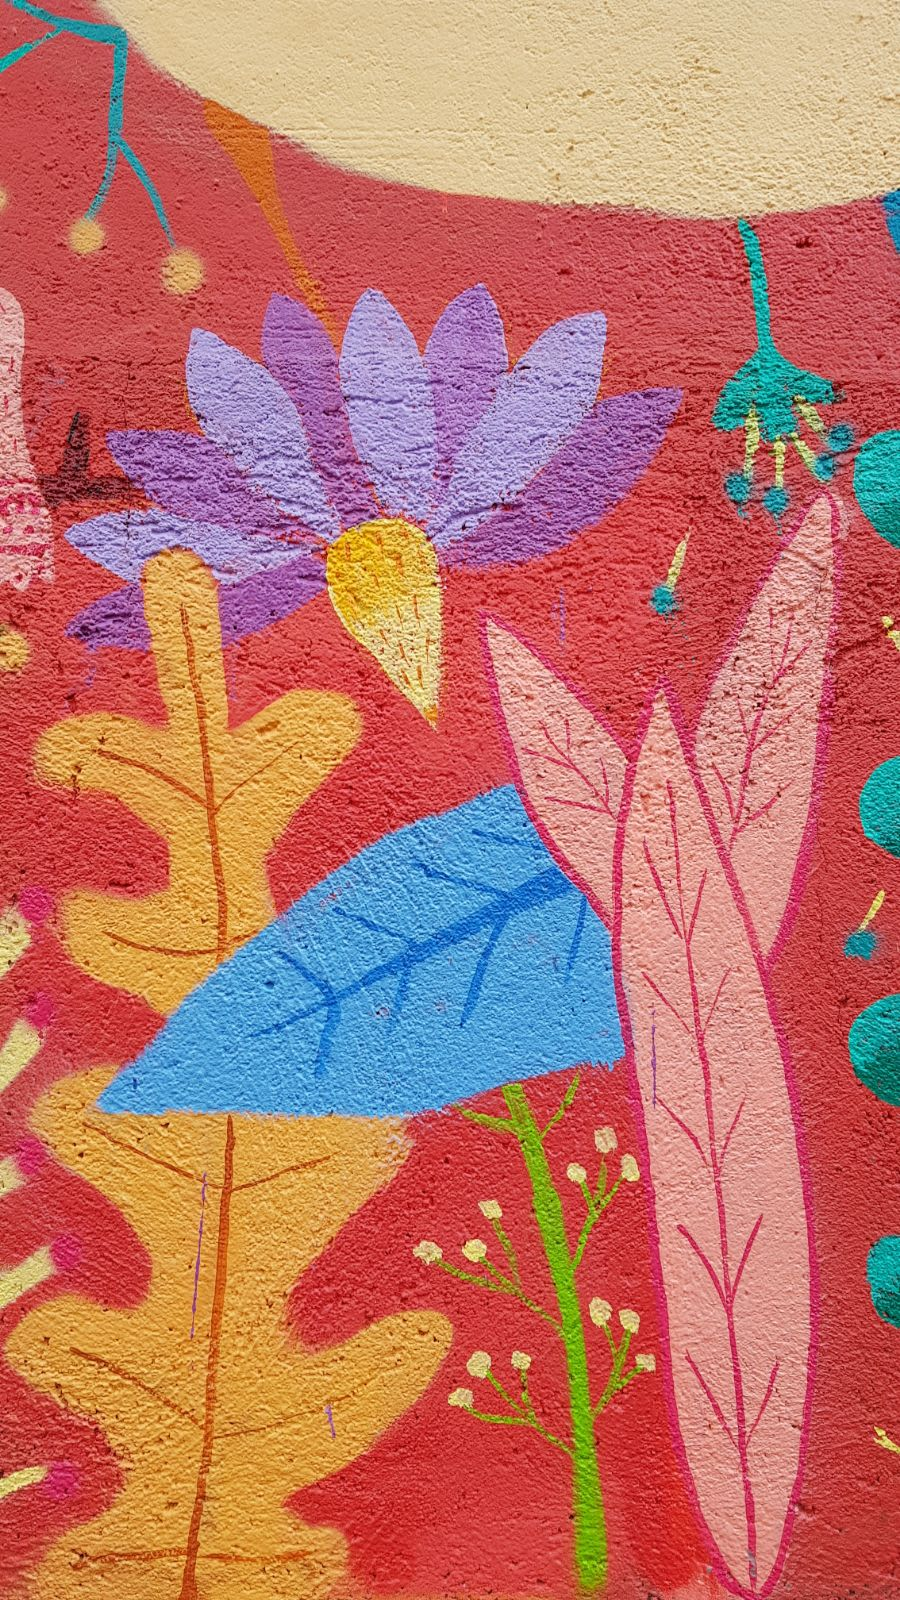 Street Murals by Its mancho seen at Alcobendas, Alcobendas - Agua-marina